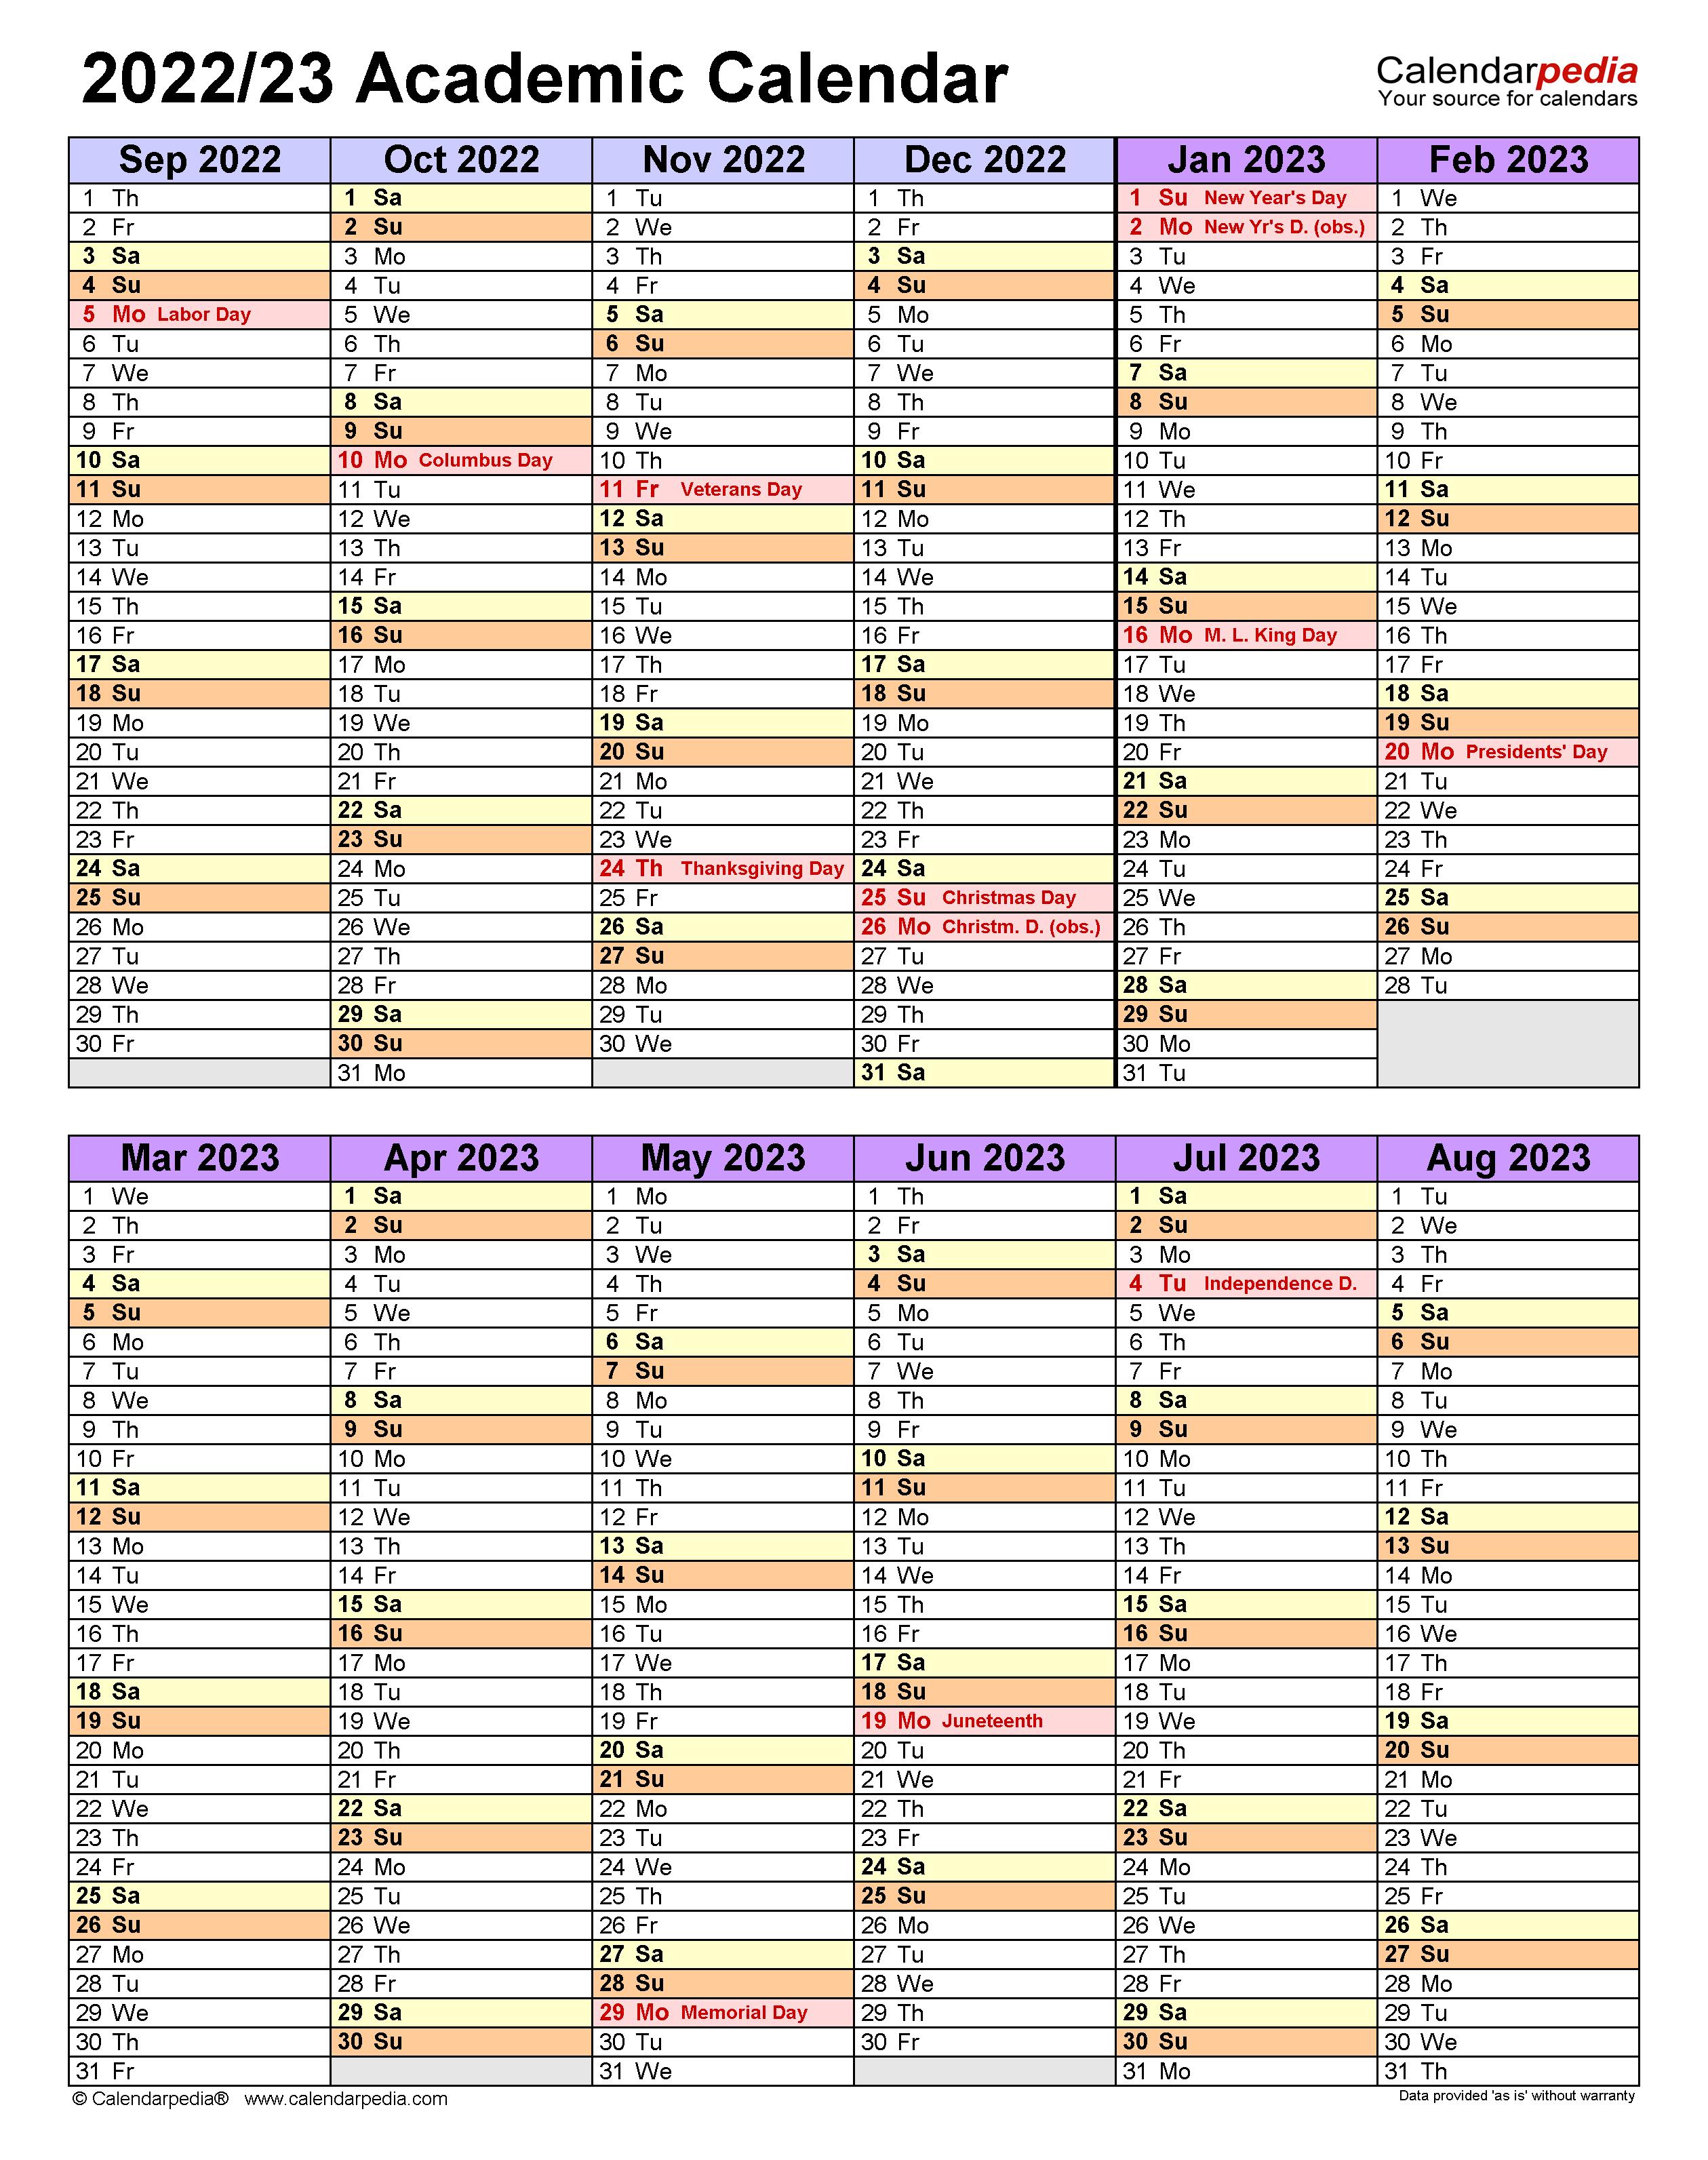 Tufts Academic Calendar 2022 2023.Academic Calendars 2022 2023 Free Printable Word Templates